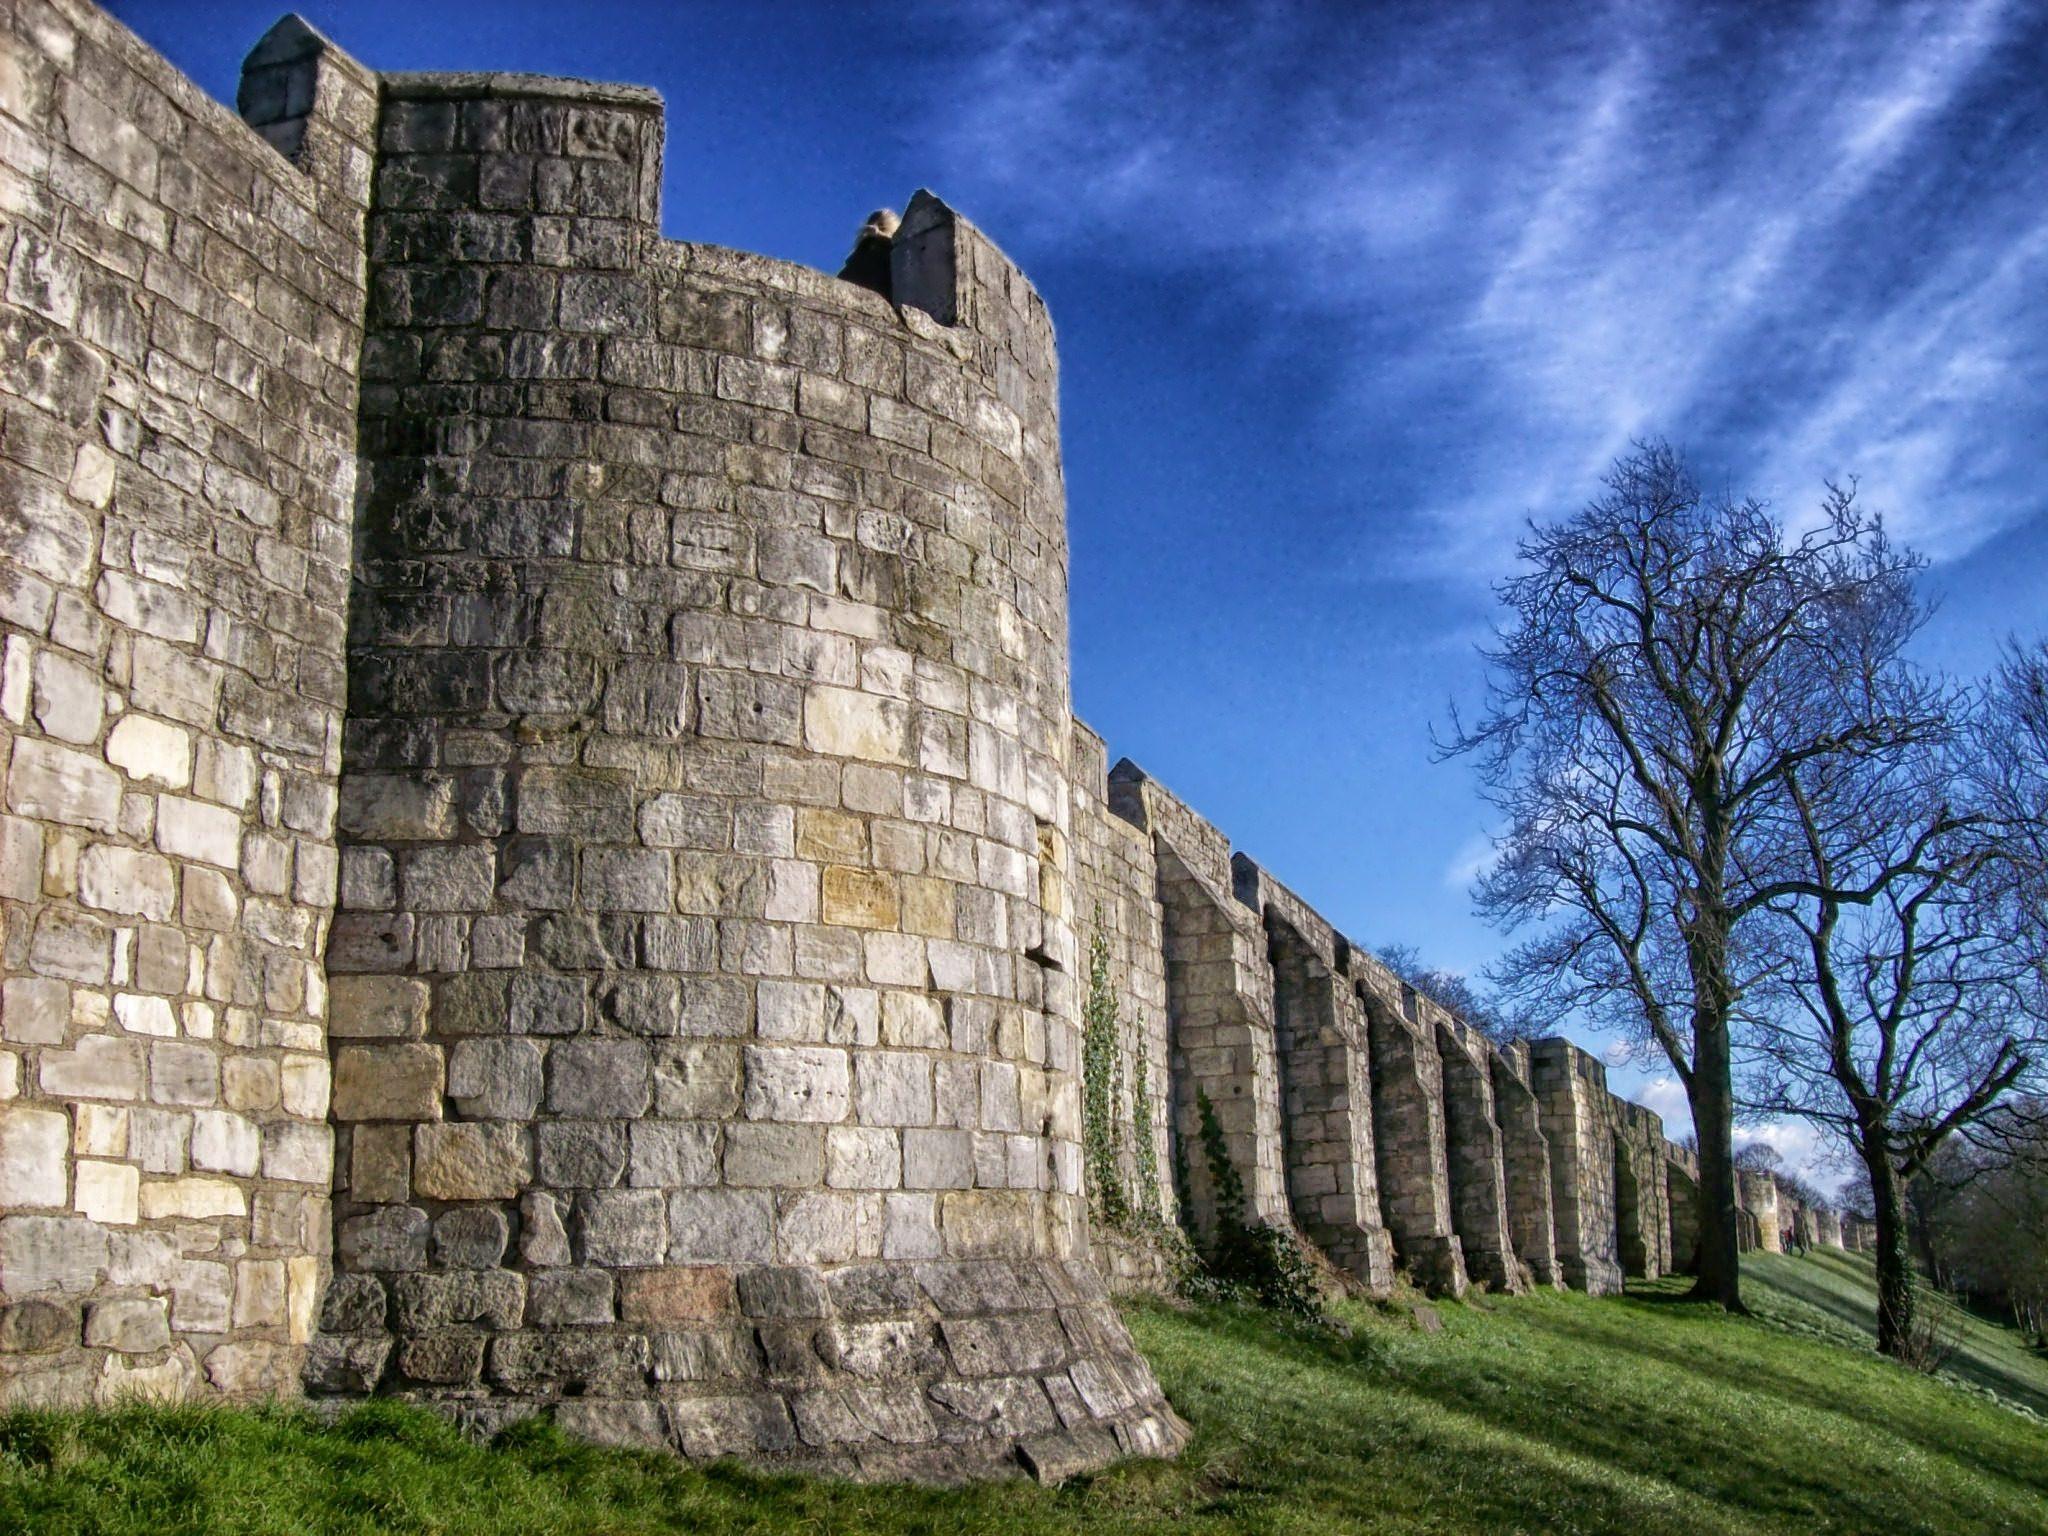 muralla, 城市, fortaleza, york, 英格兰 - 高清壁纸 - 教授-falken.com